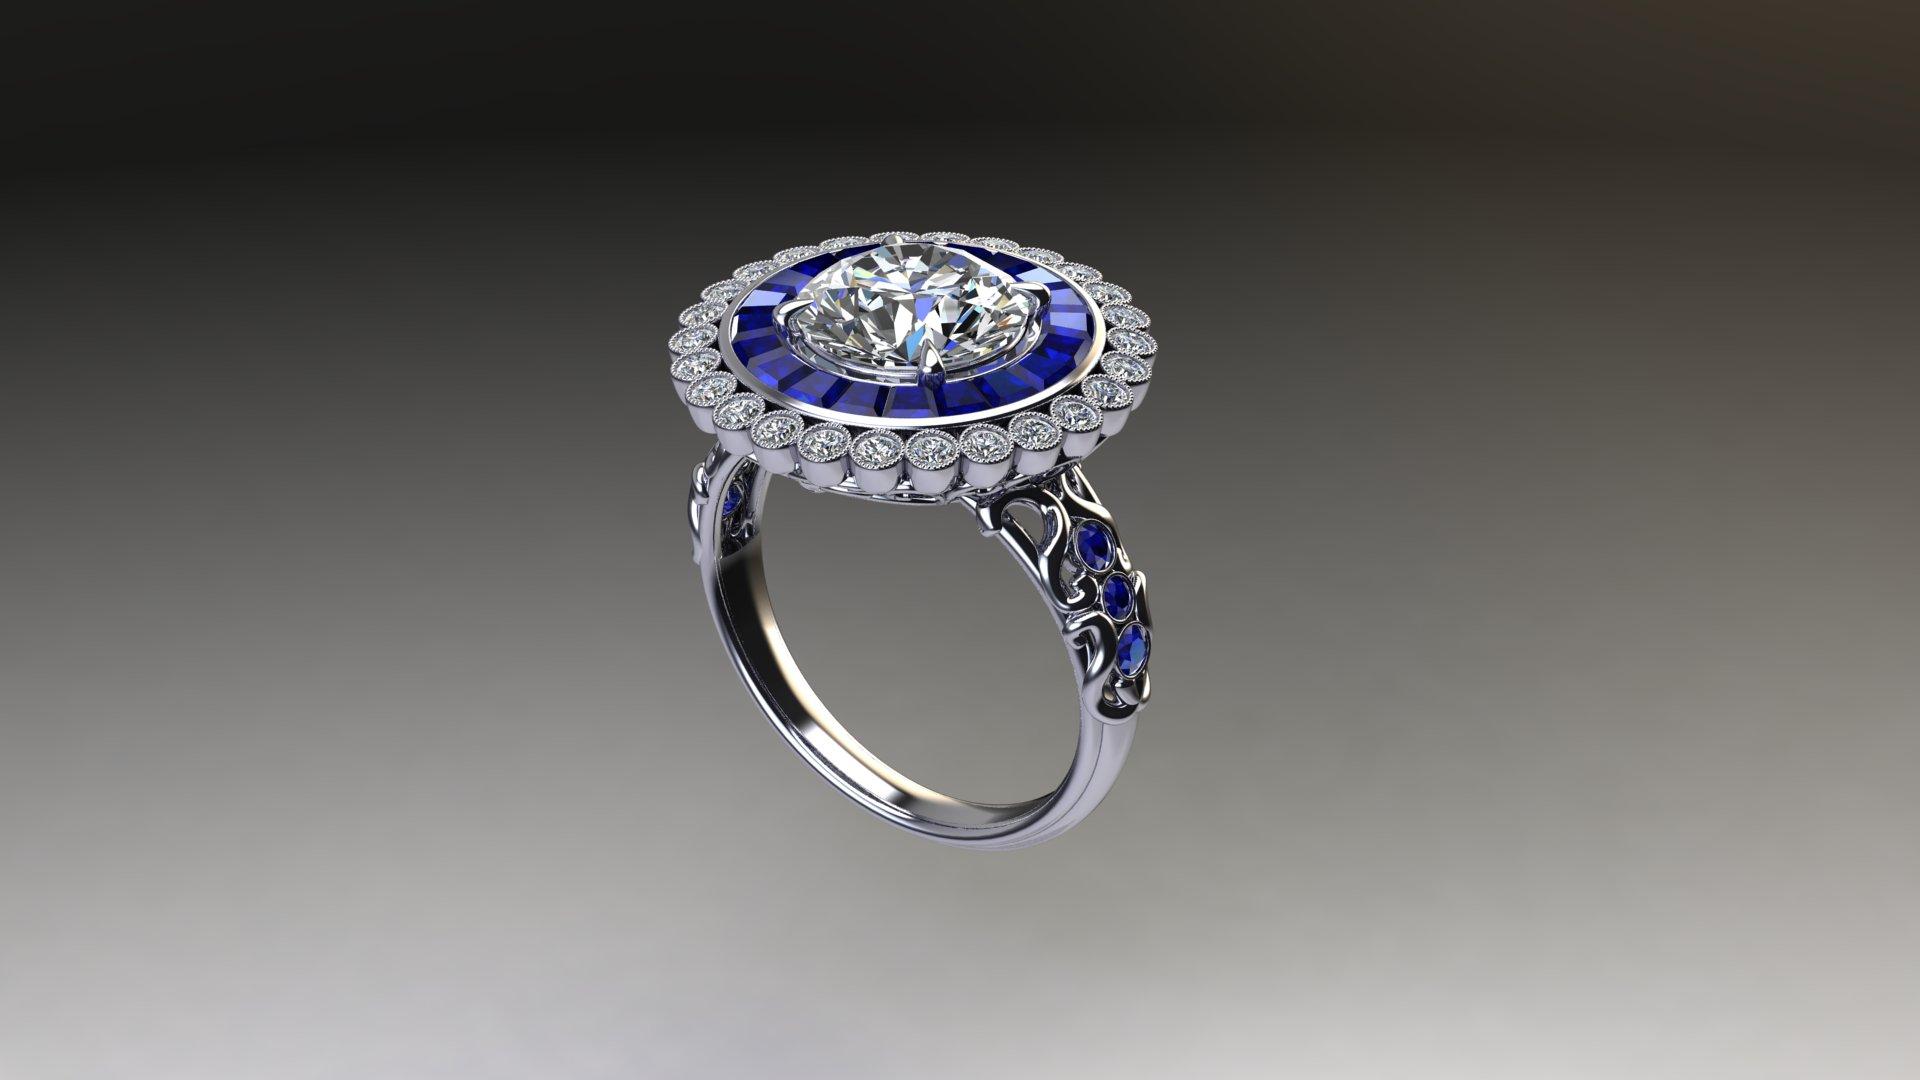 Edwardian Round Ring